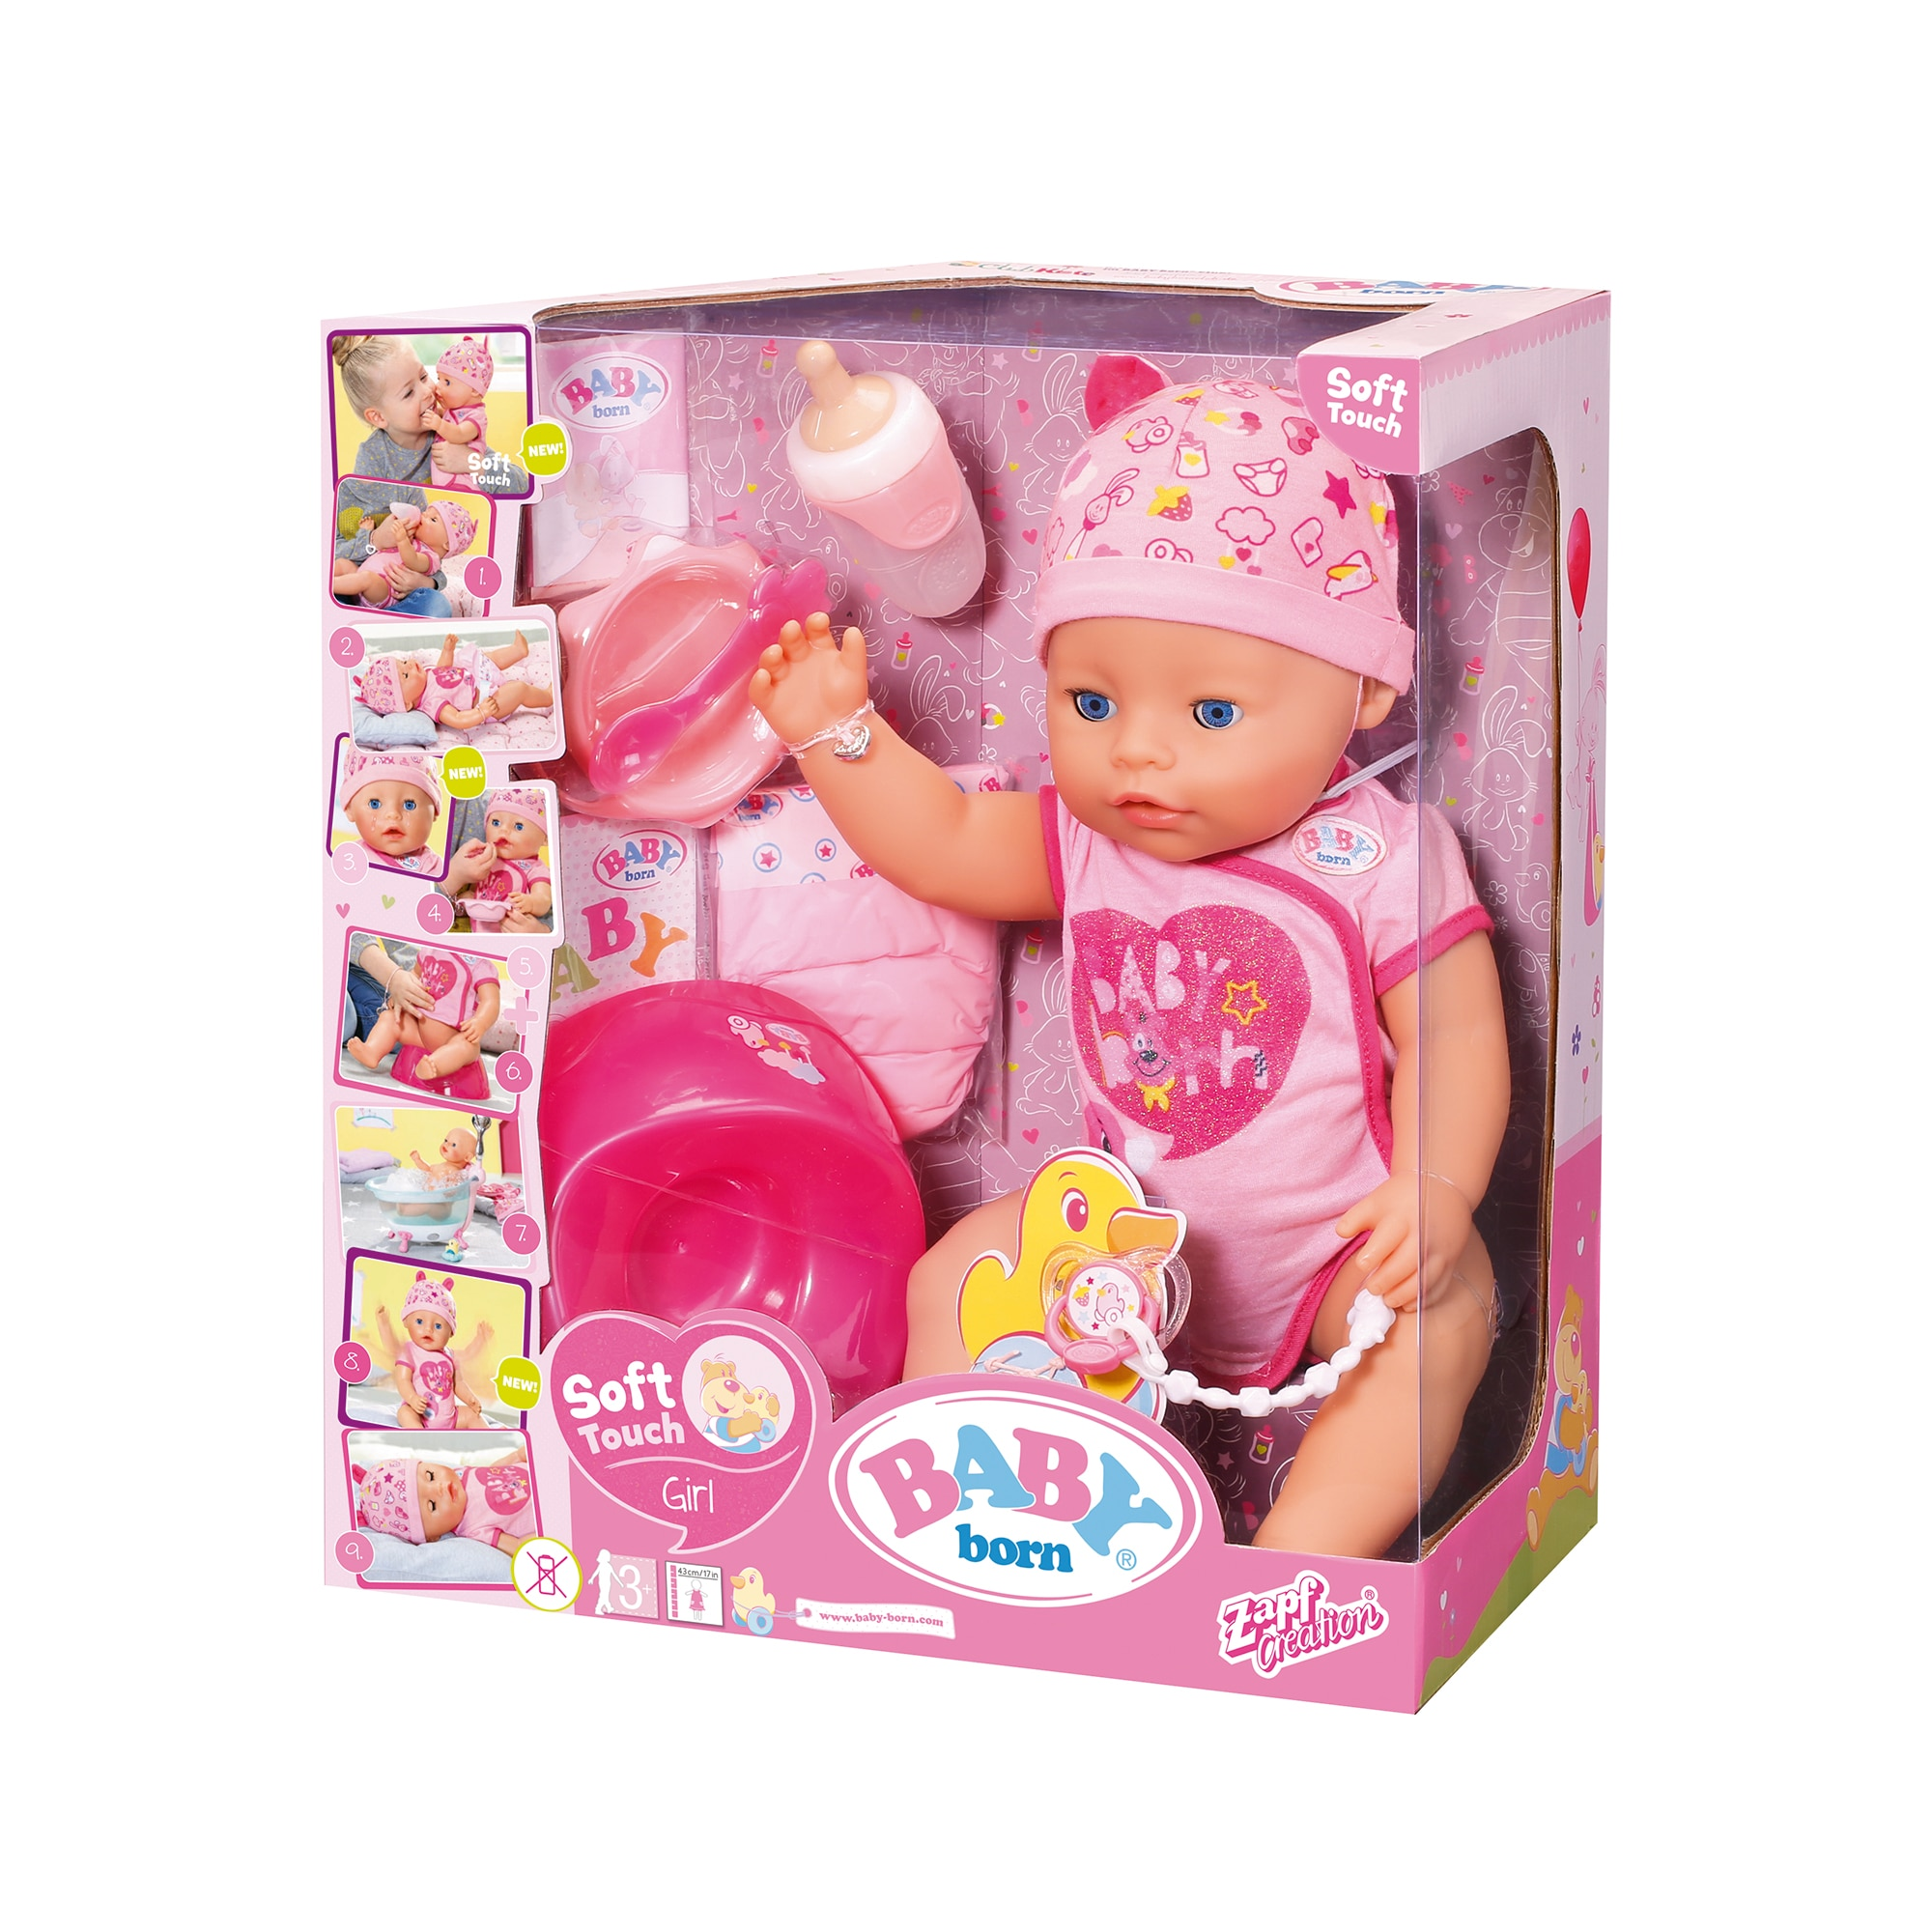 Fotografie Papusa Zapf Baby Born - Fetita interactiva, corp moale, roz, 43 cm, 11 accesorii